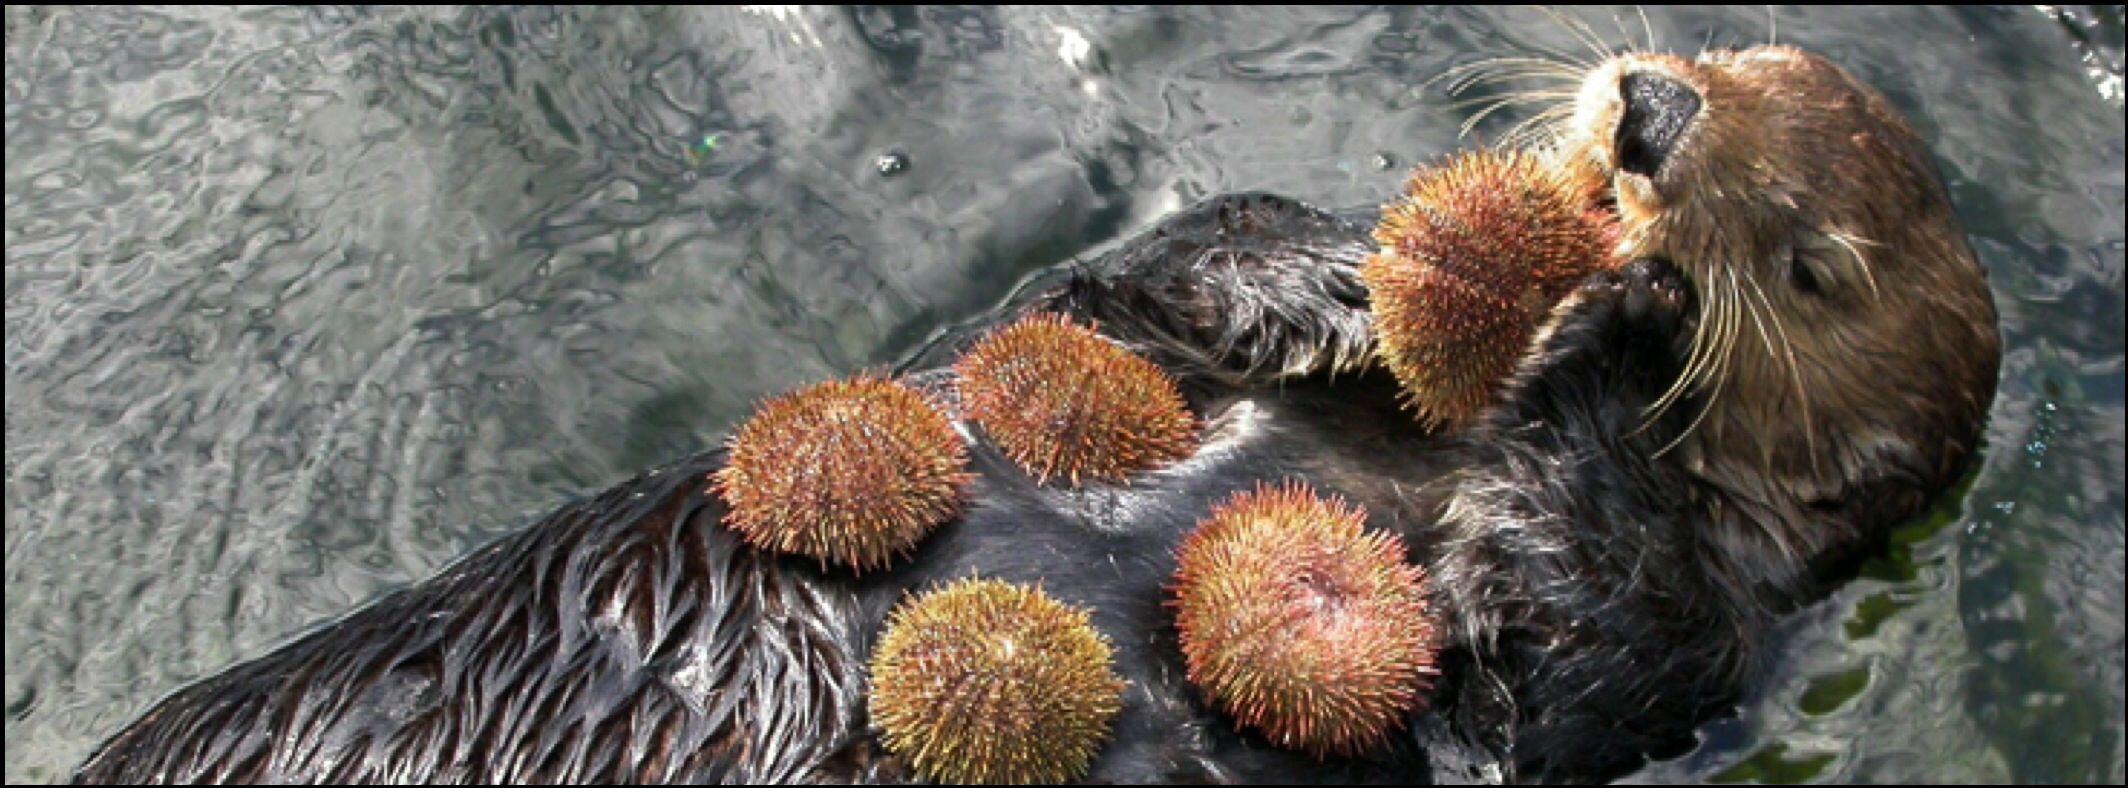 Sea Otter eating sea urchin.   ~Facebook Cover Photos~   Pinterest ...